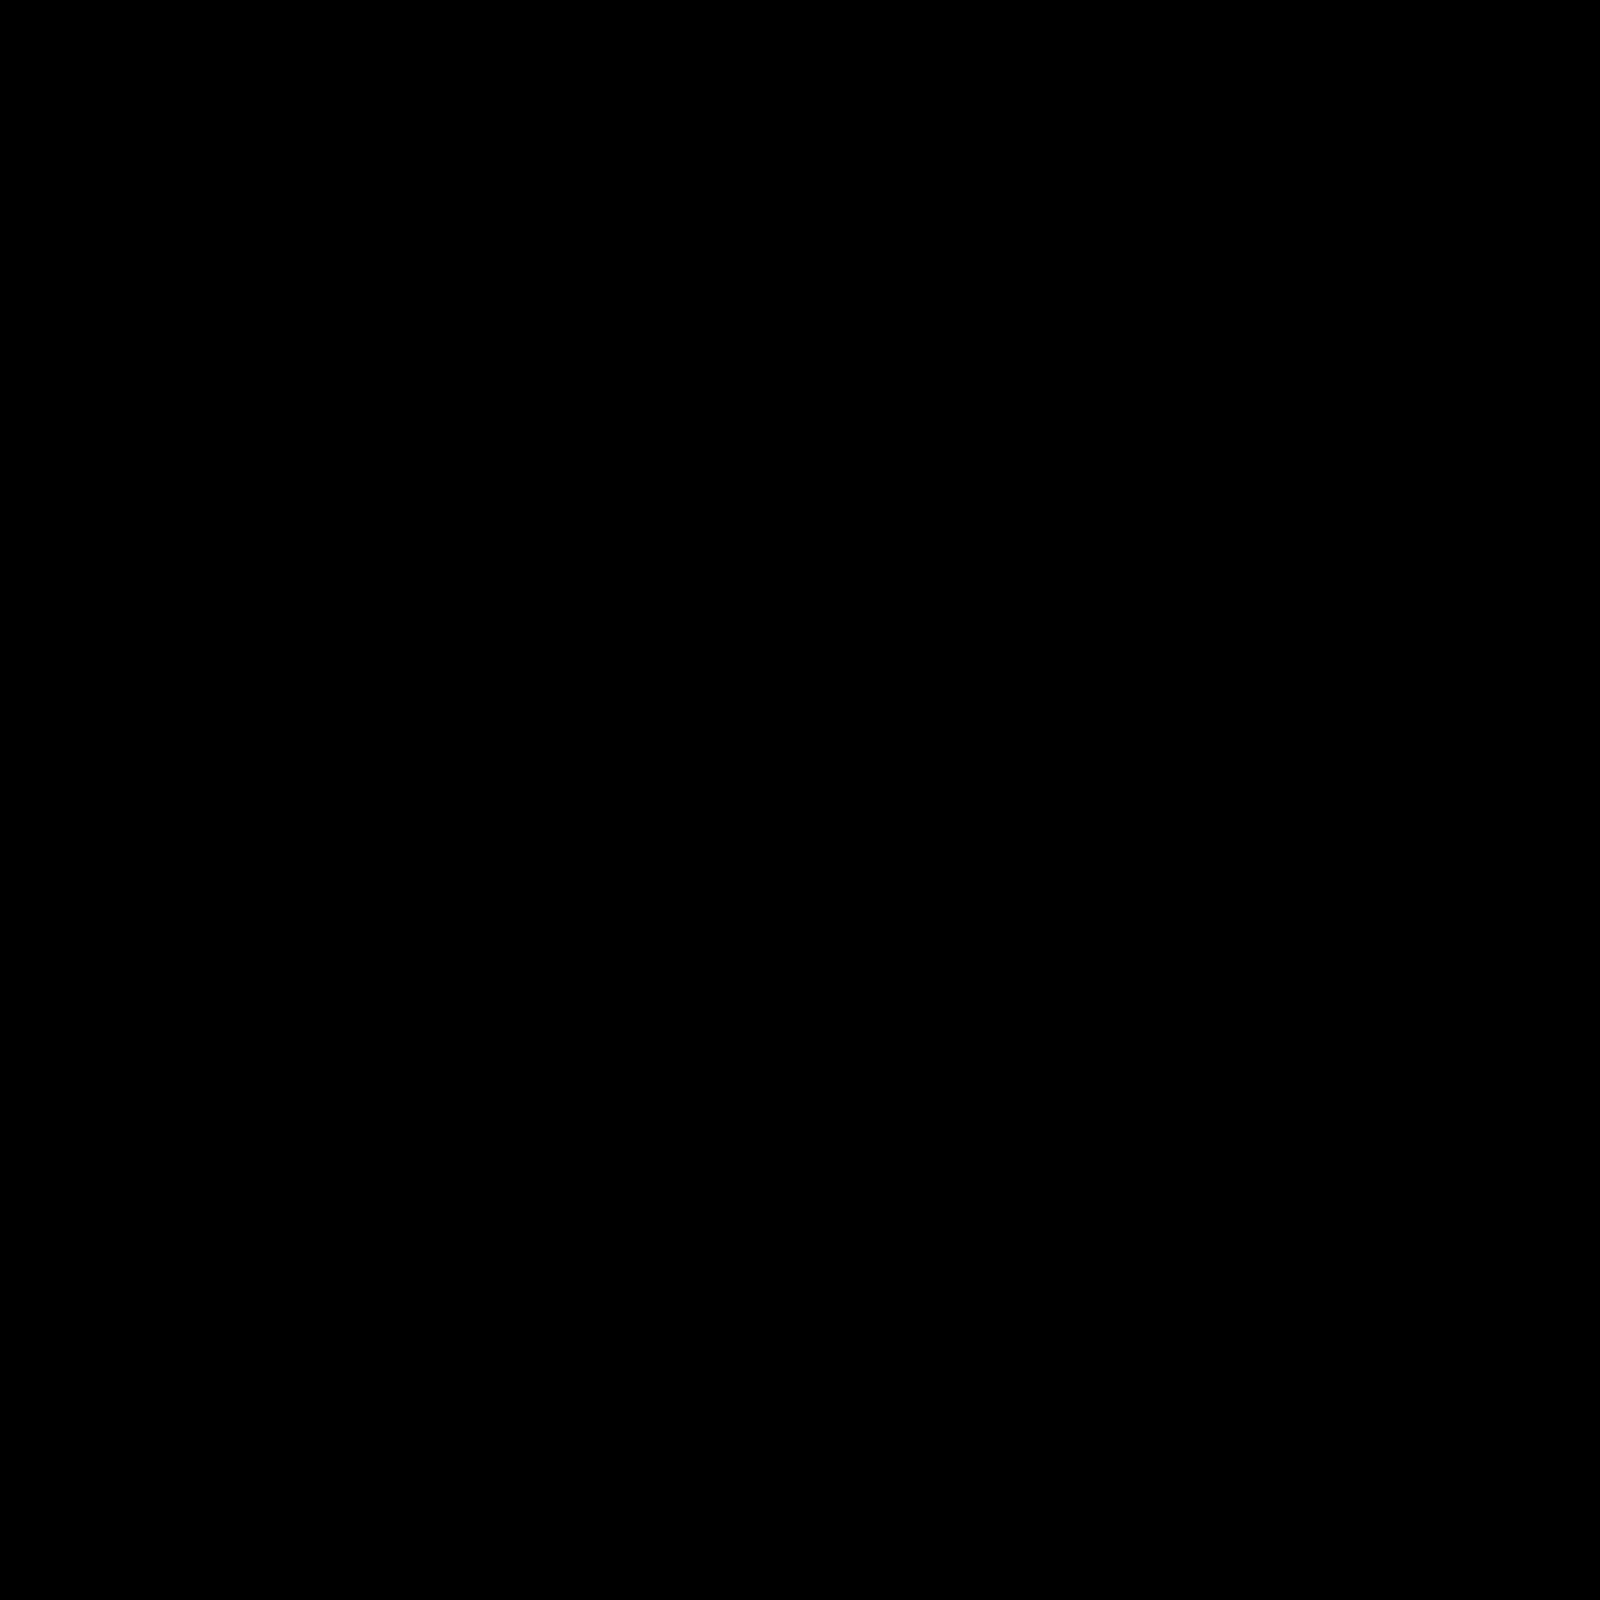 Envelope Number icon